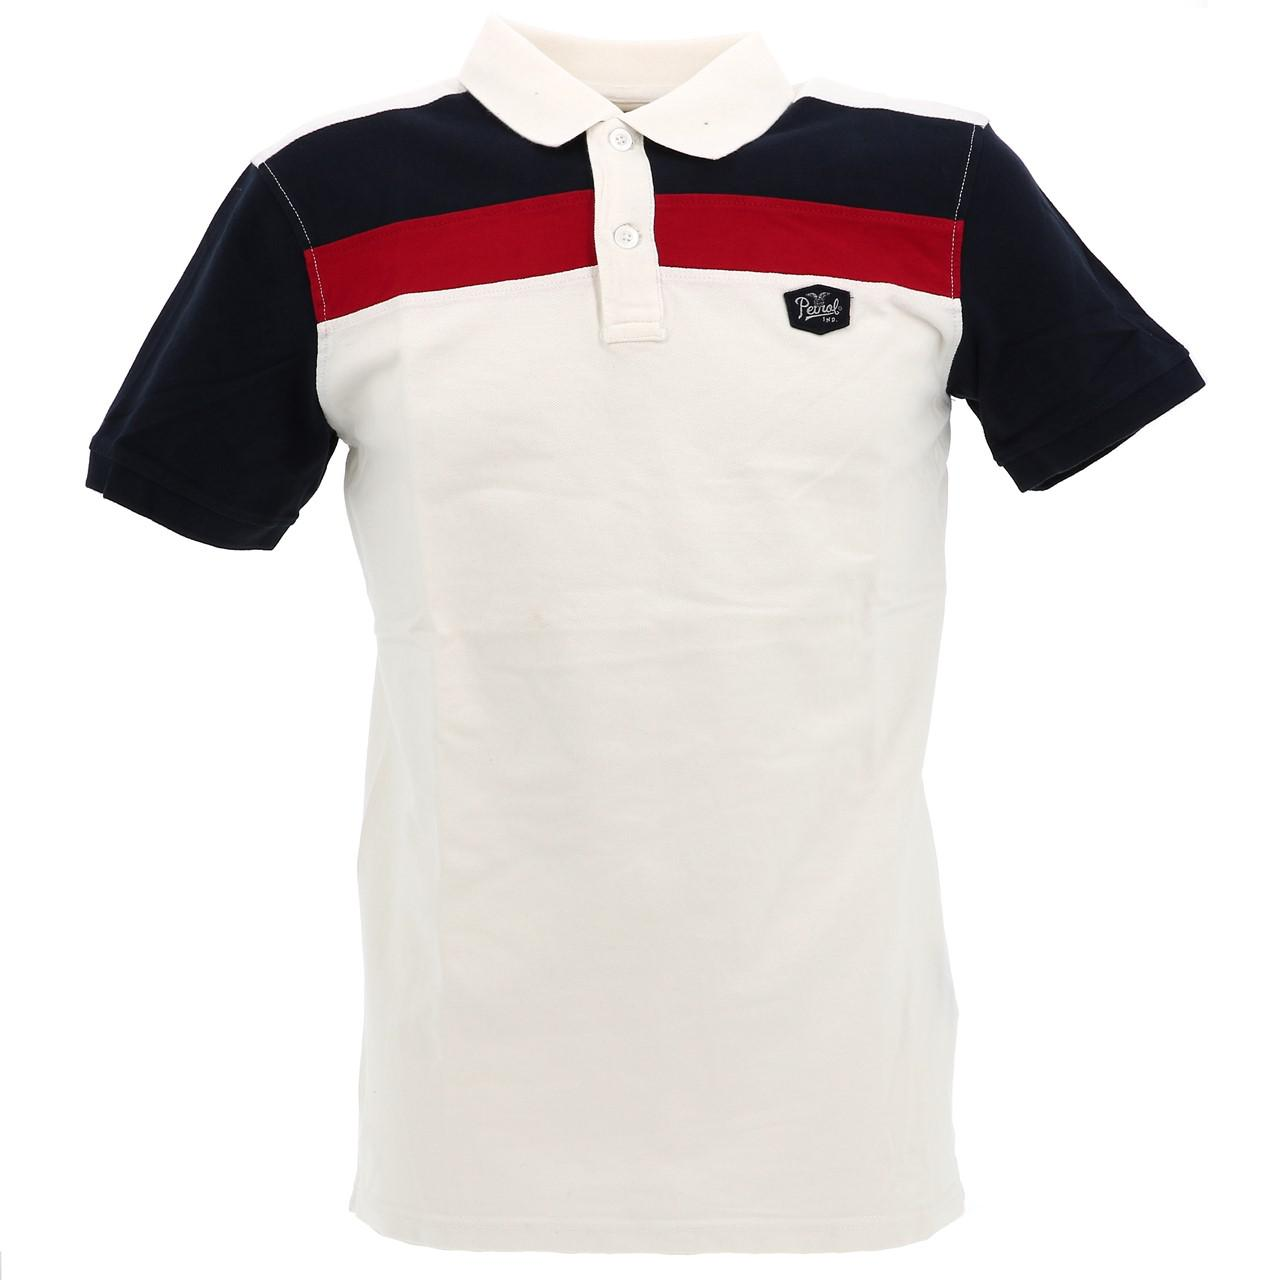 Short-Sleeve-Polo-Petrol-Industries-Pol916-White-Mc-Polo-White-18085-New